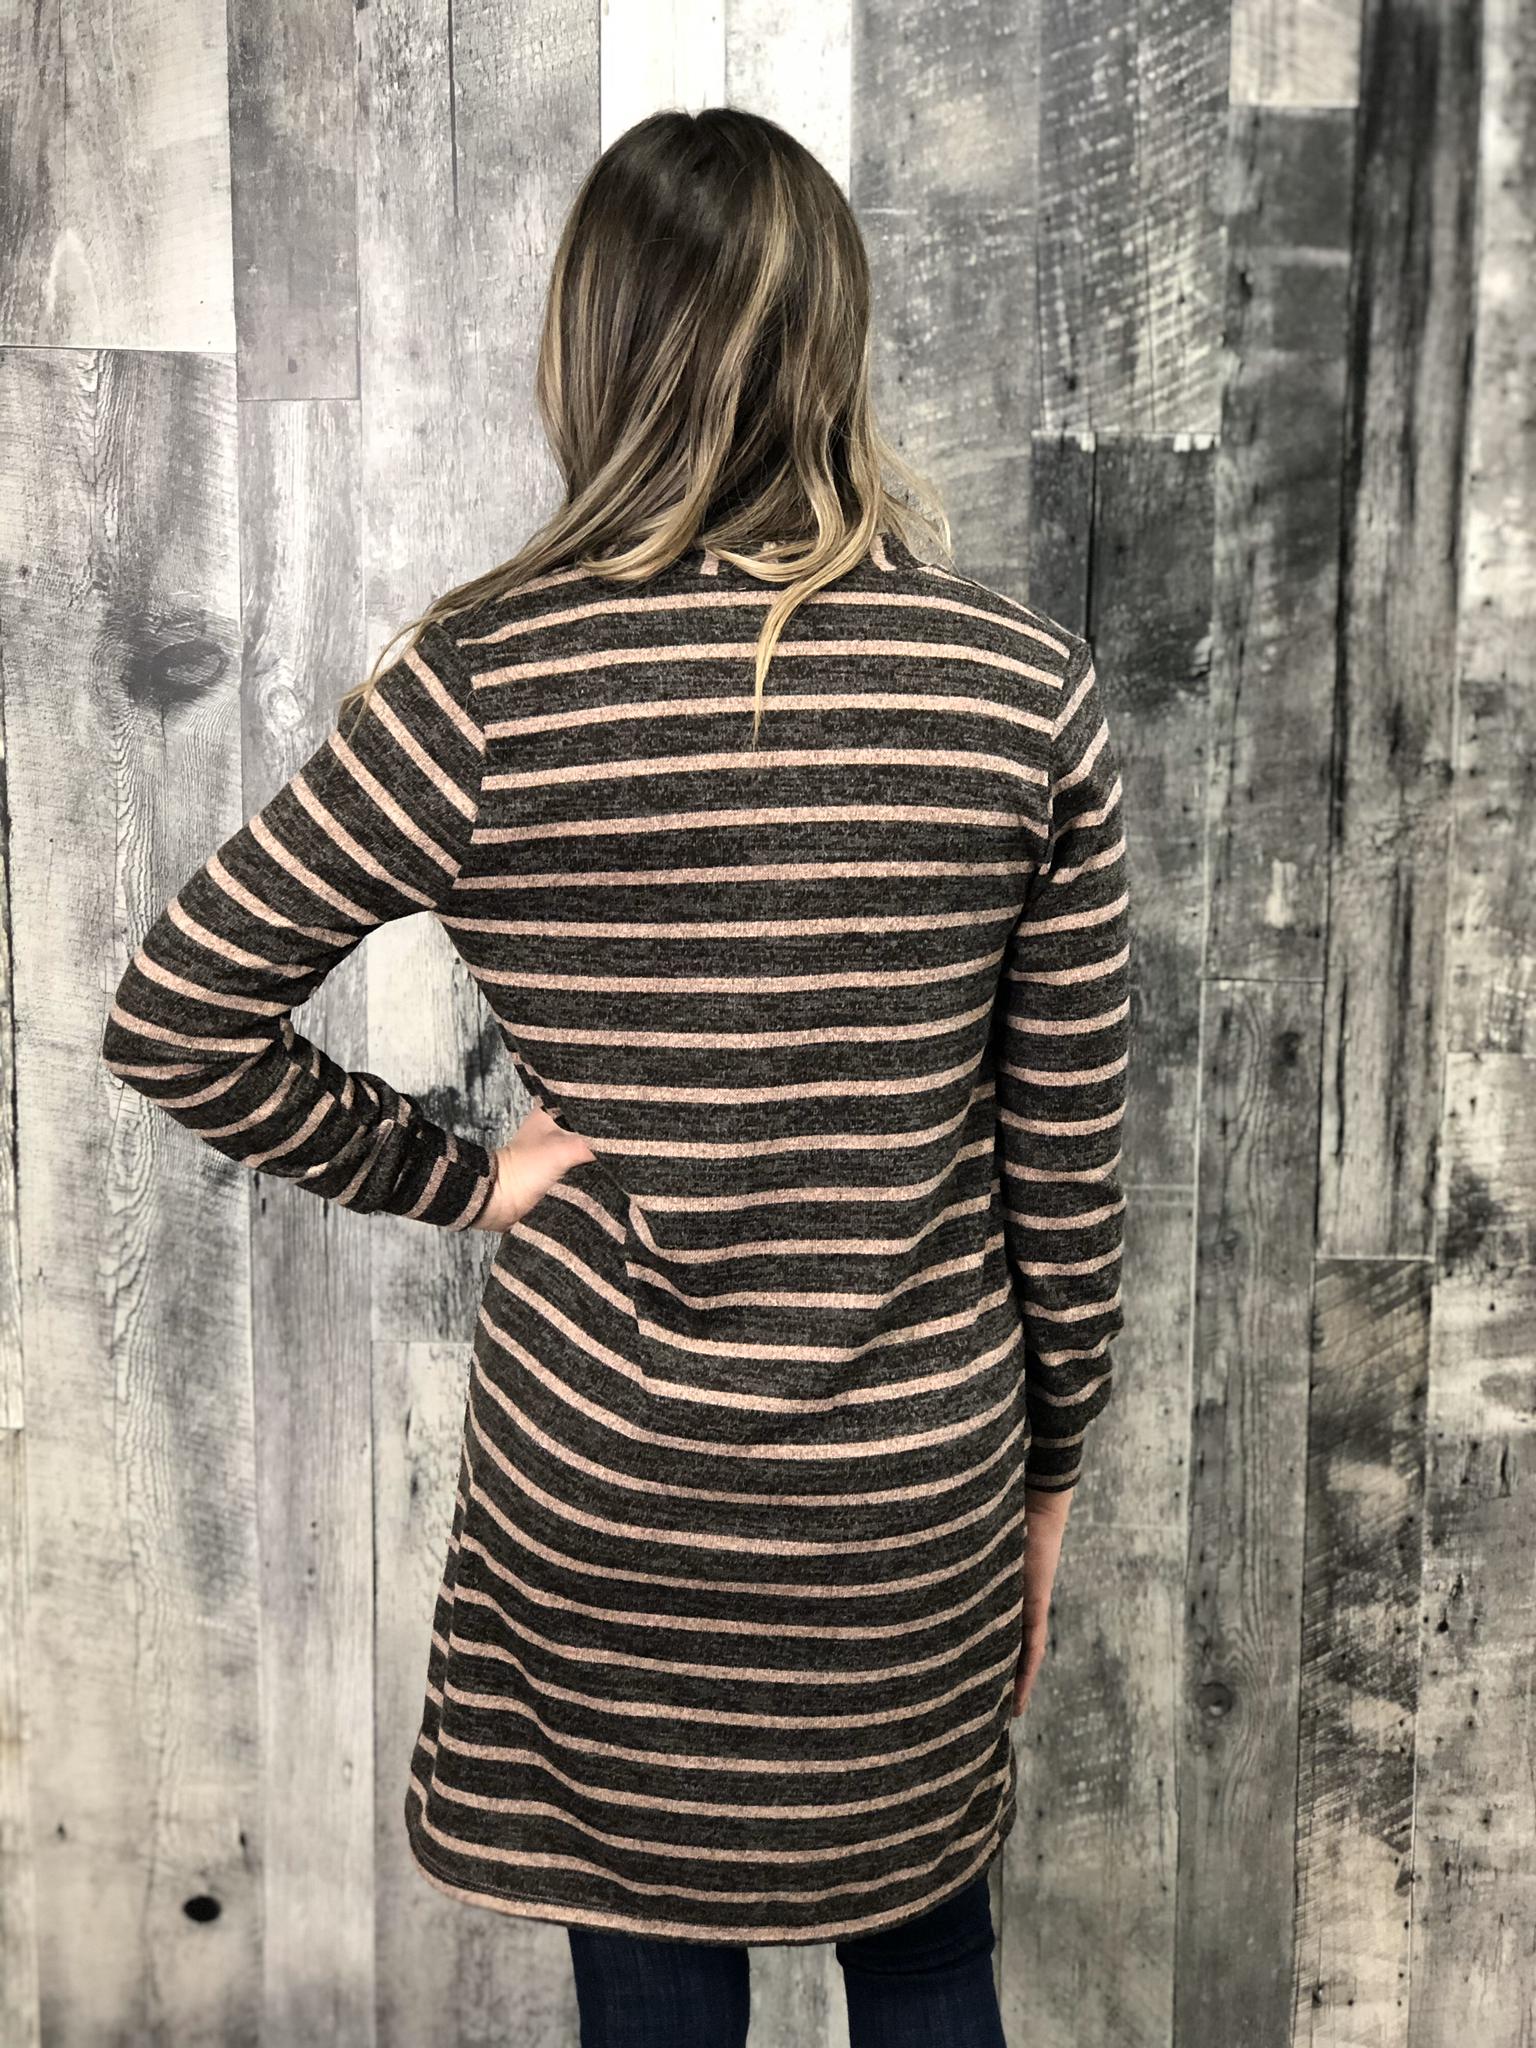 Blush\Chocolate Striped Lightweight Cardigan